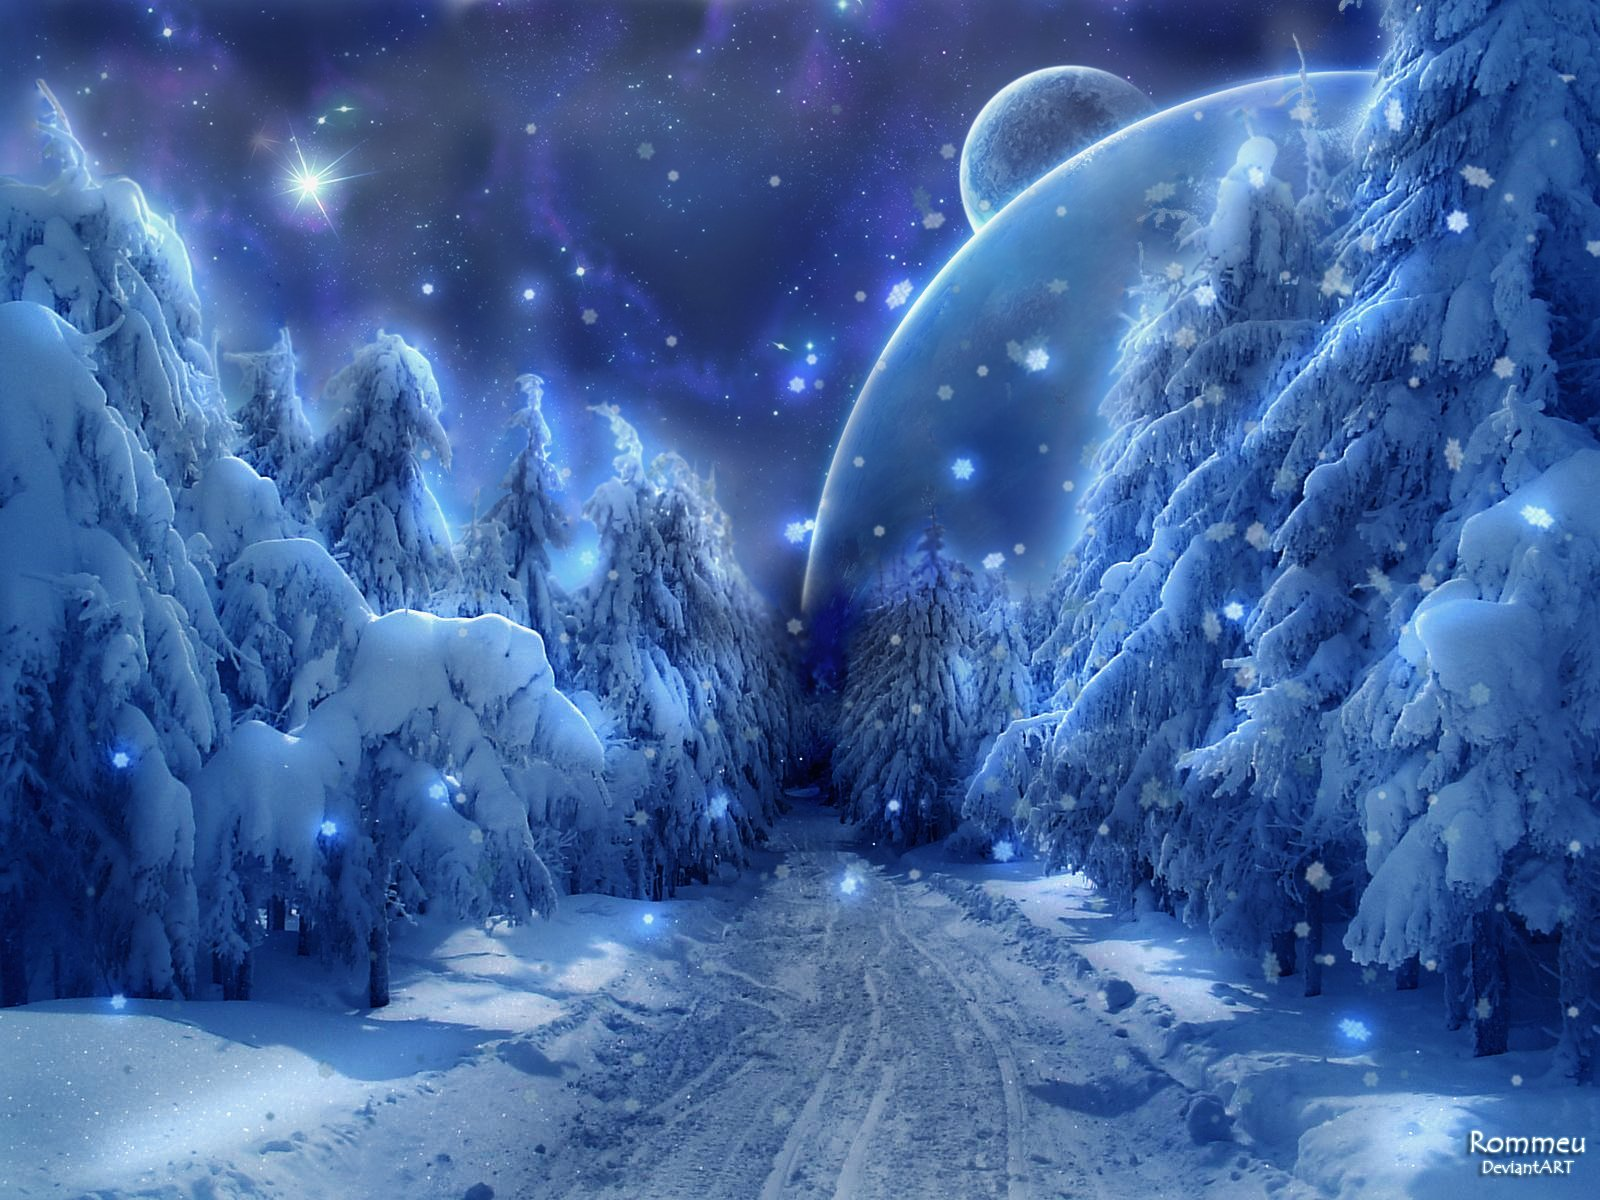 Winter Snow Wallpaper 1600x1200 Winter Snow Fantasy Art Alien 1600x1200